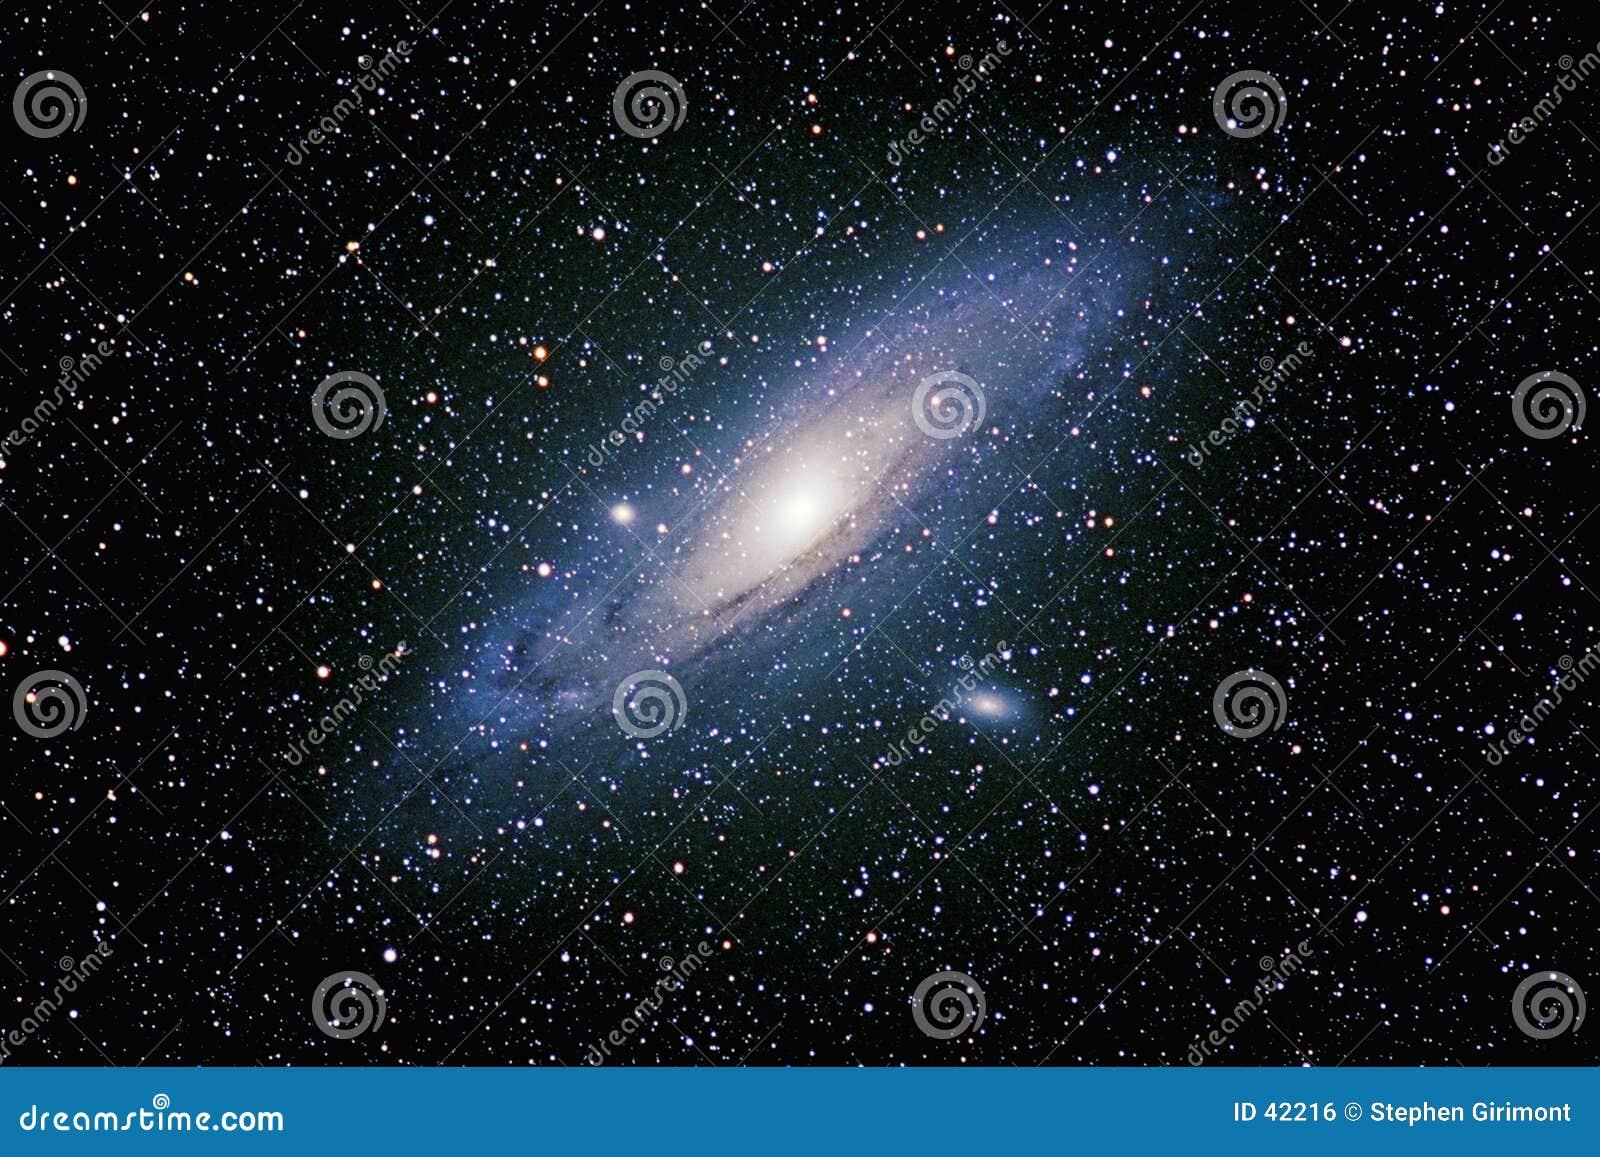 andromeda galaxy stock photo image of space andromeda On andromedafree